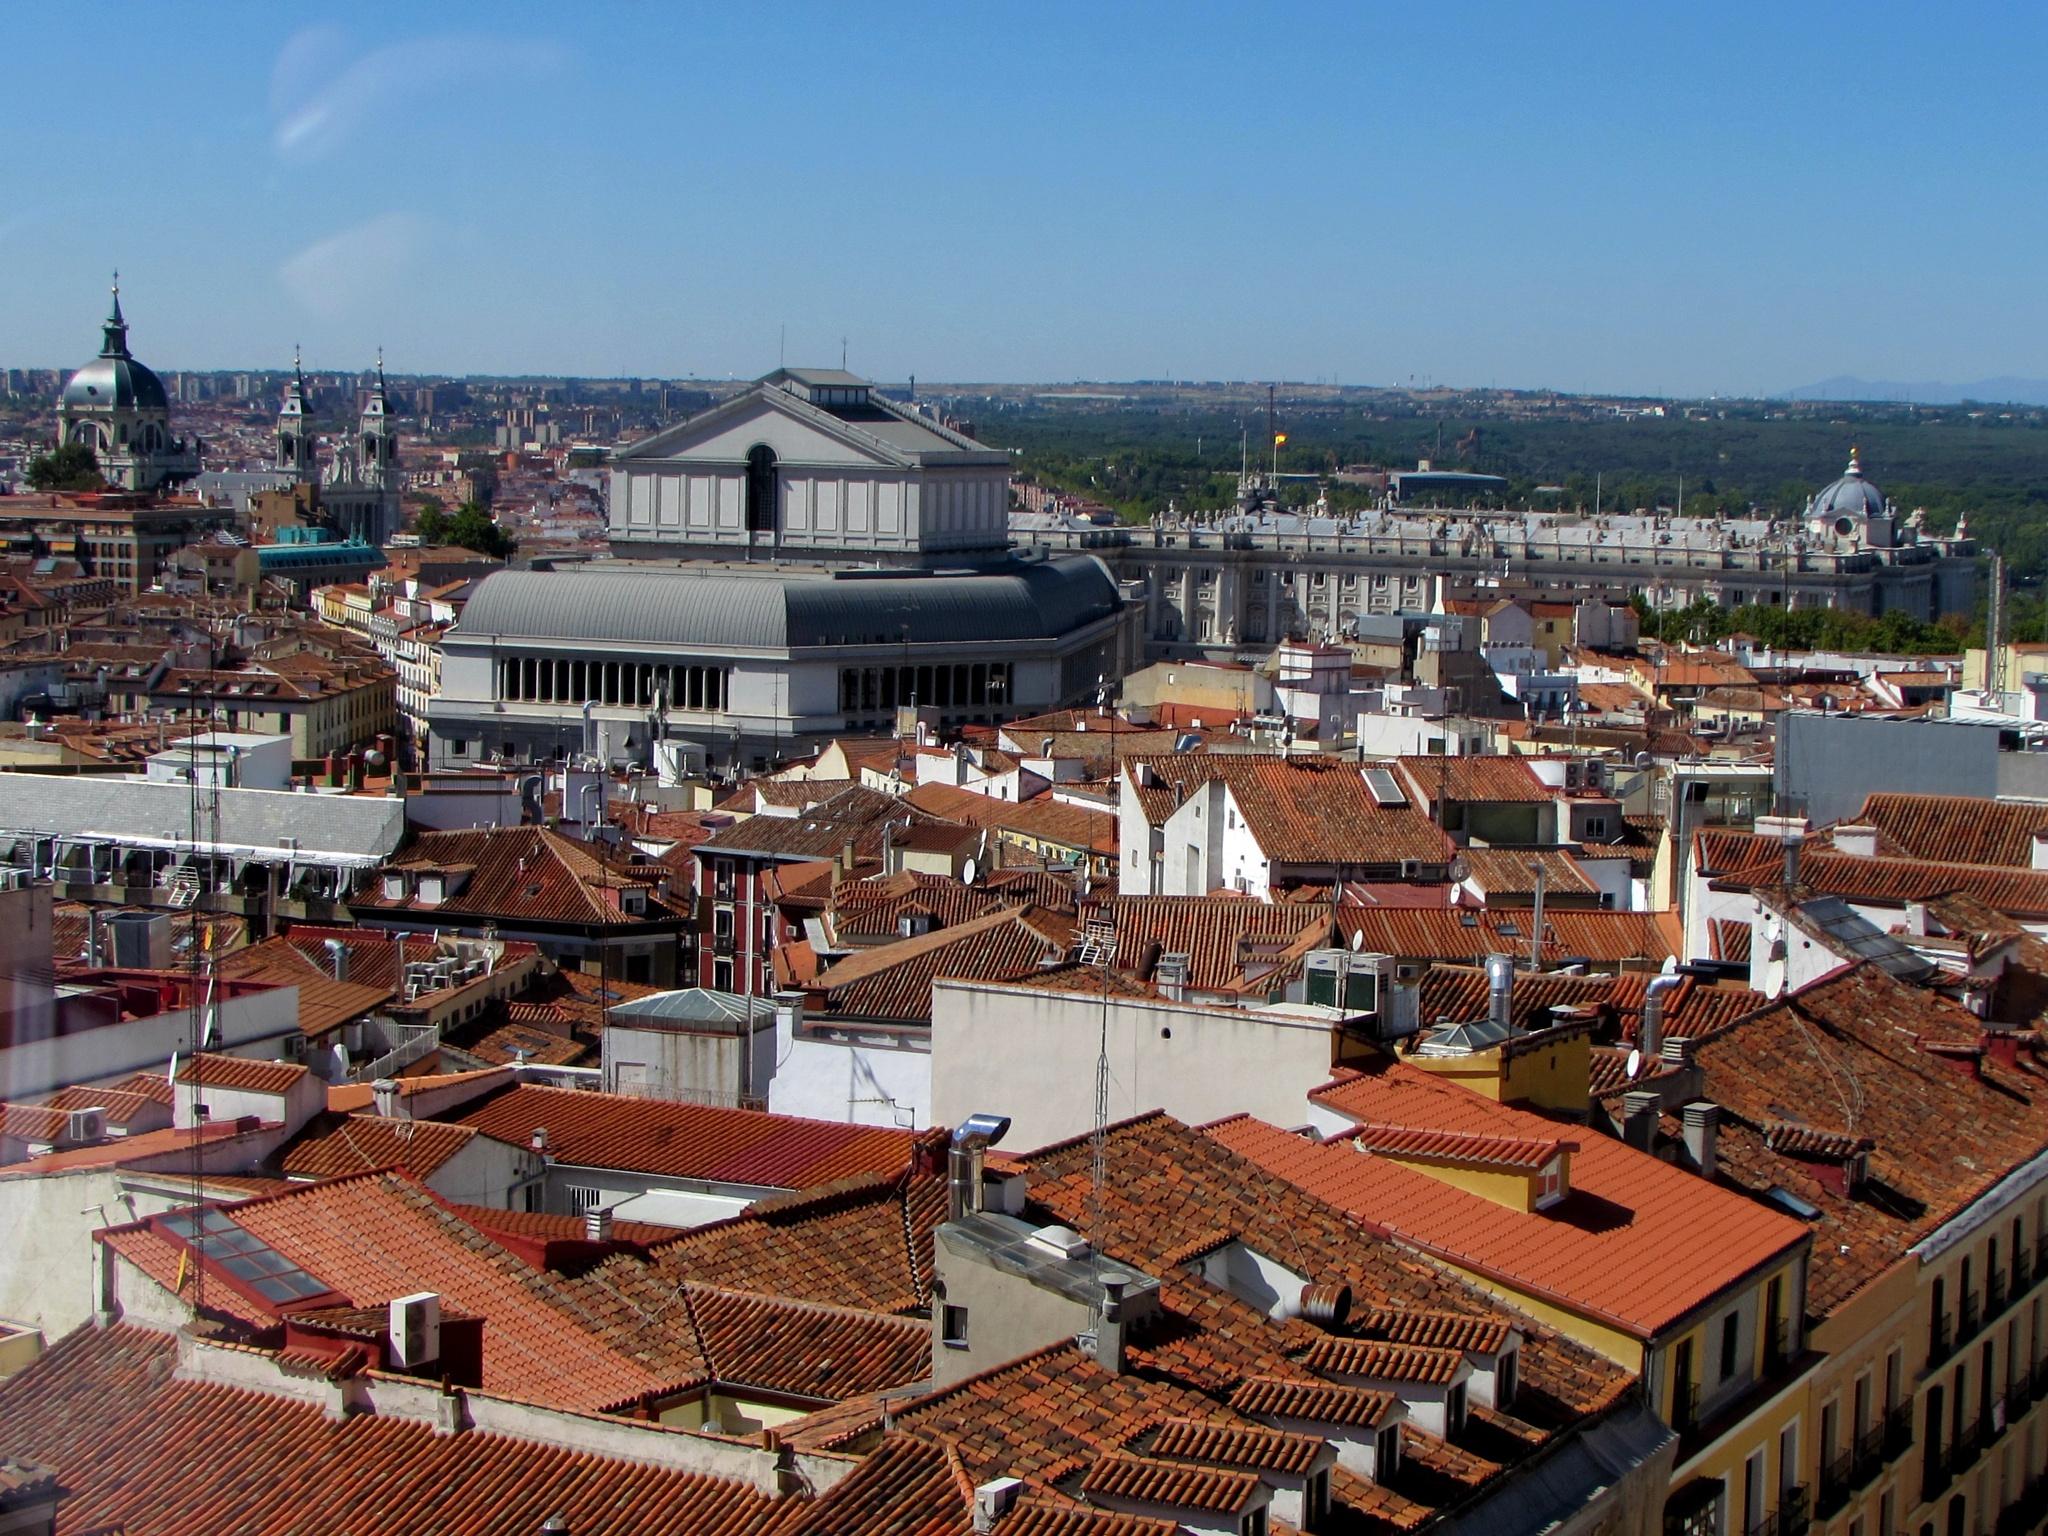 Madrid roofs by Isabel Gonzalez Martil